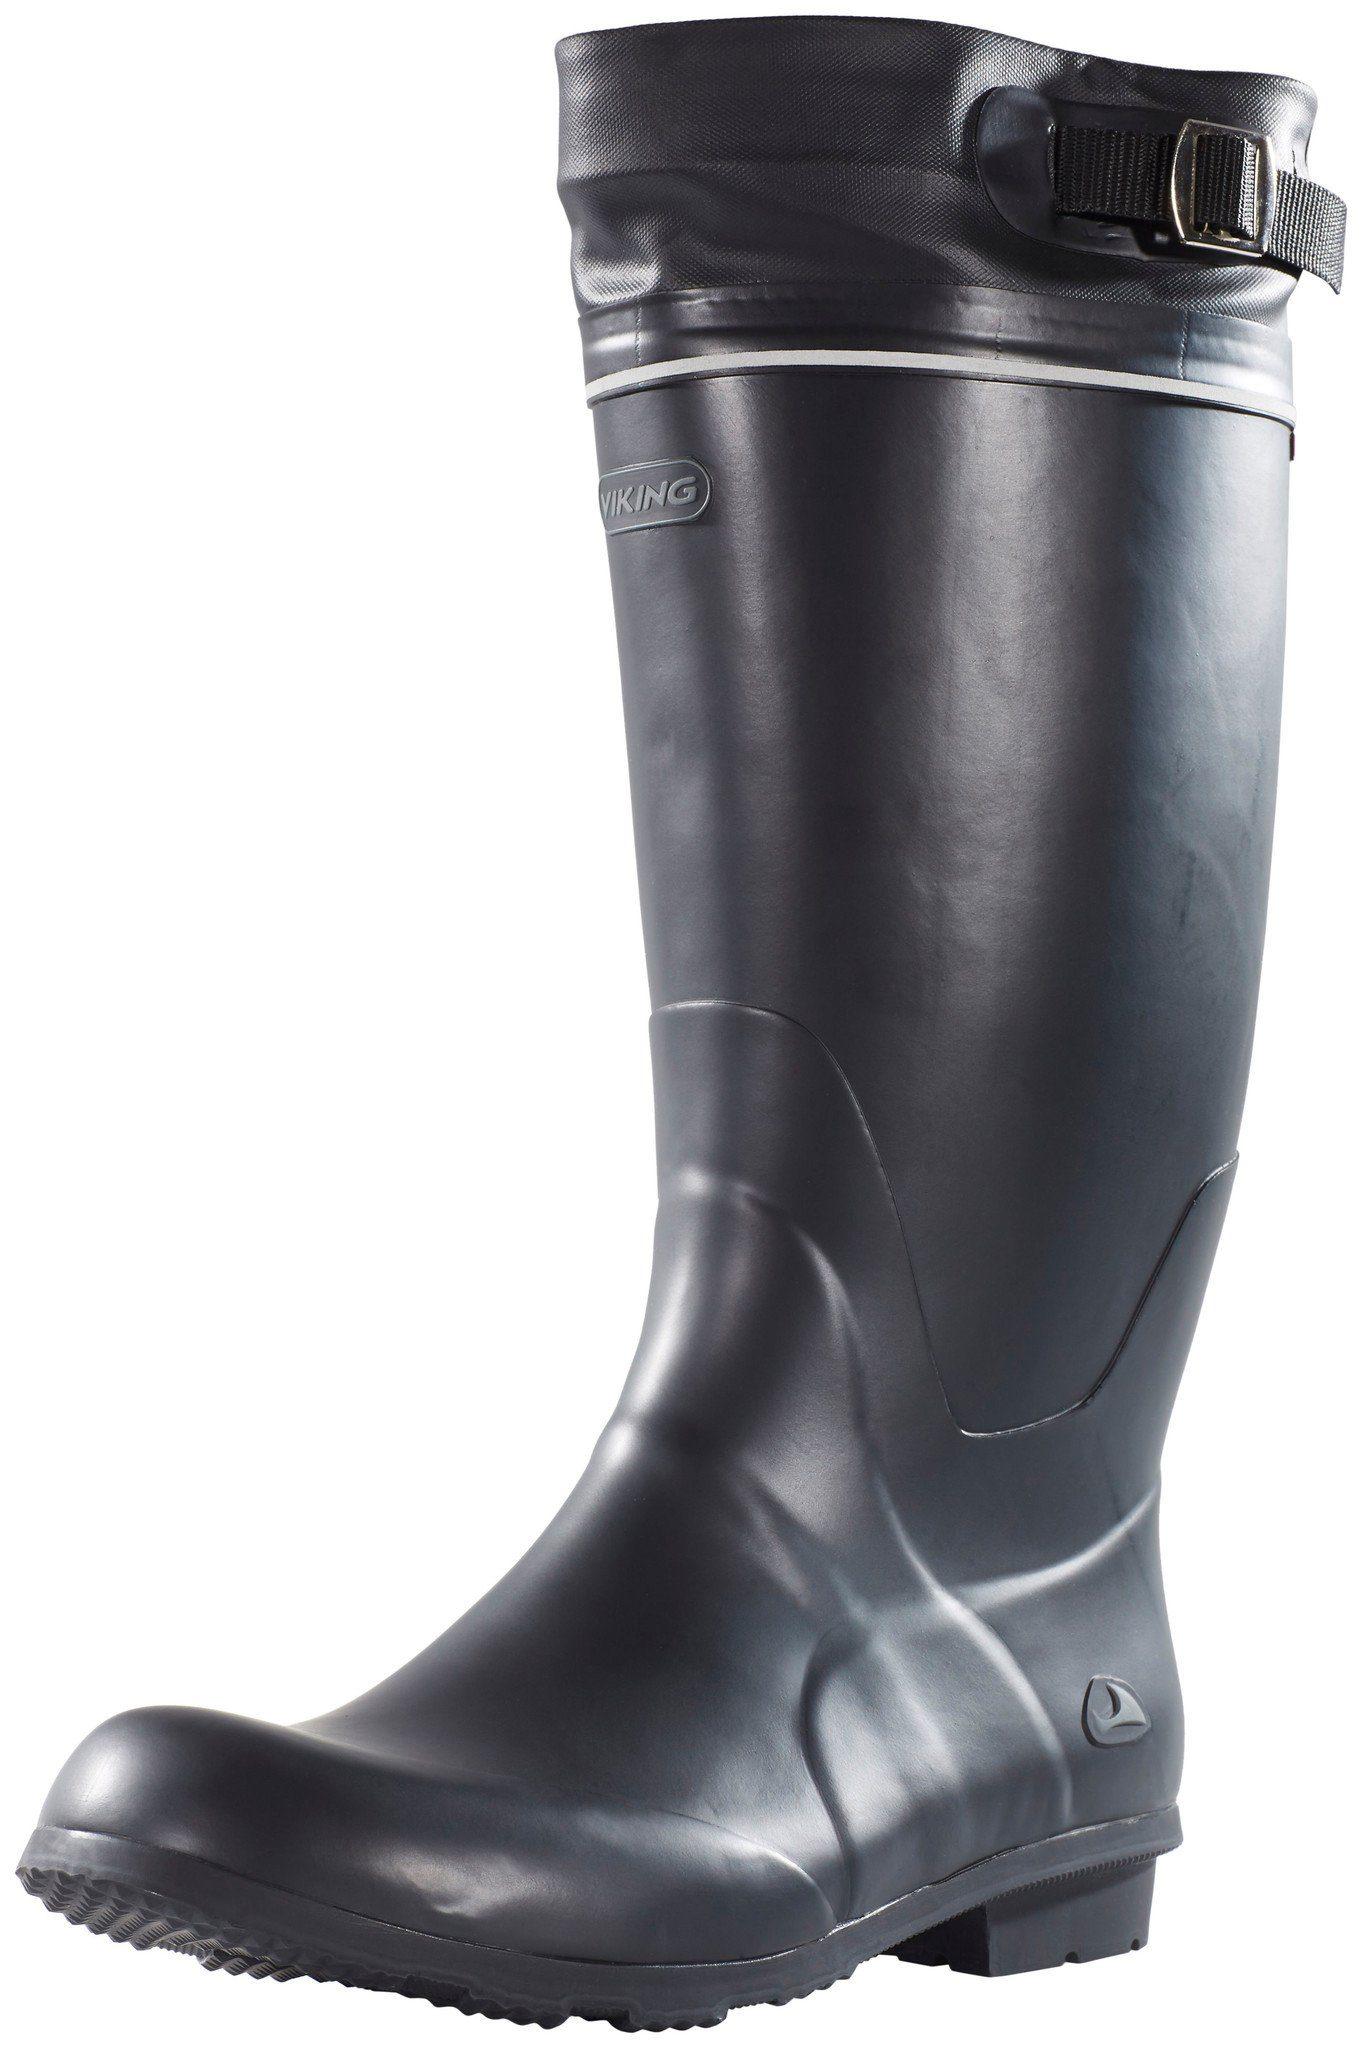 VIKING Trekkingschuh »Viking Kunto Boots Unisex«